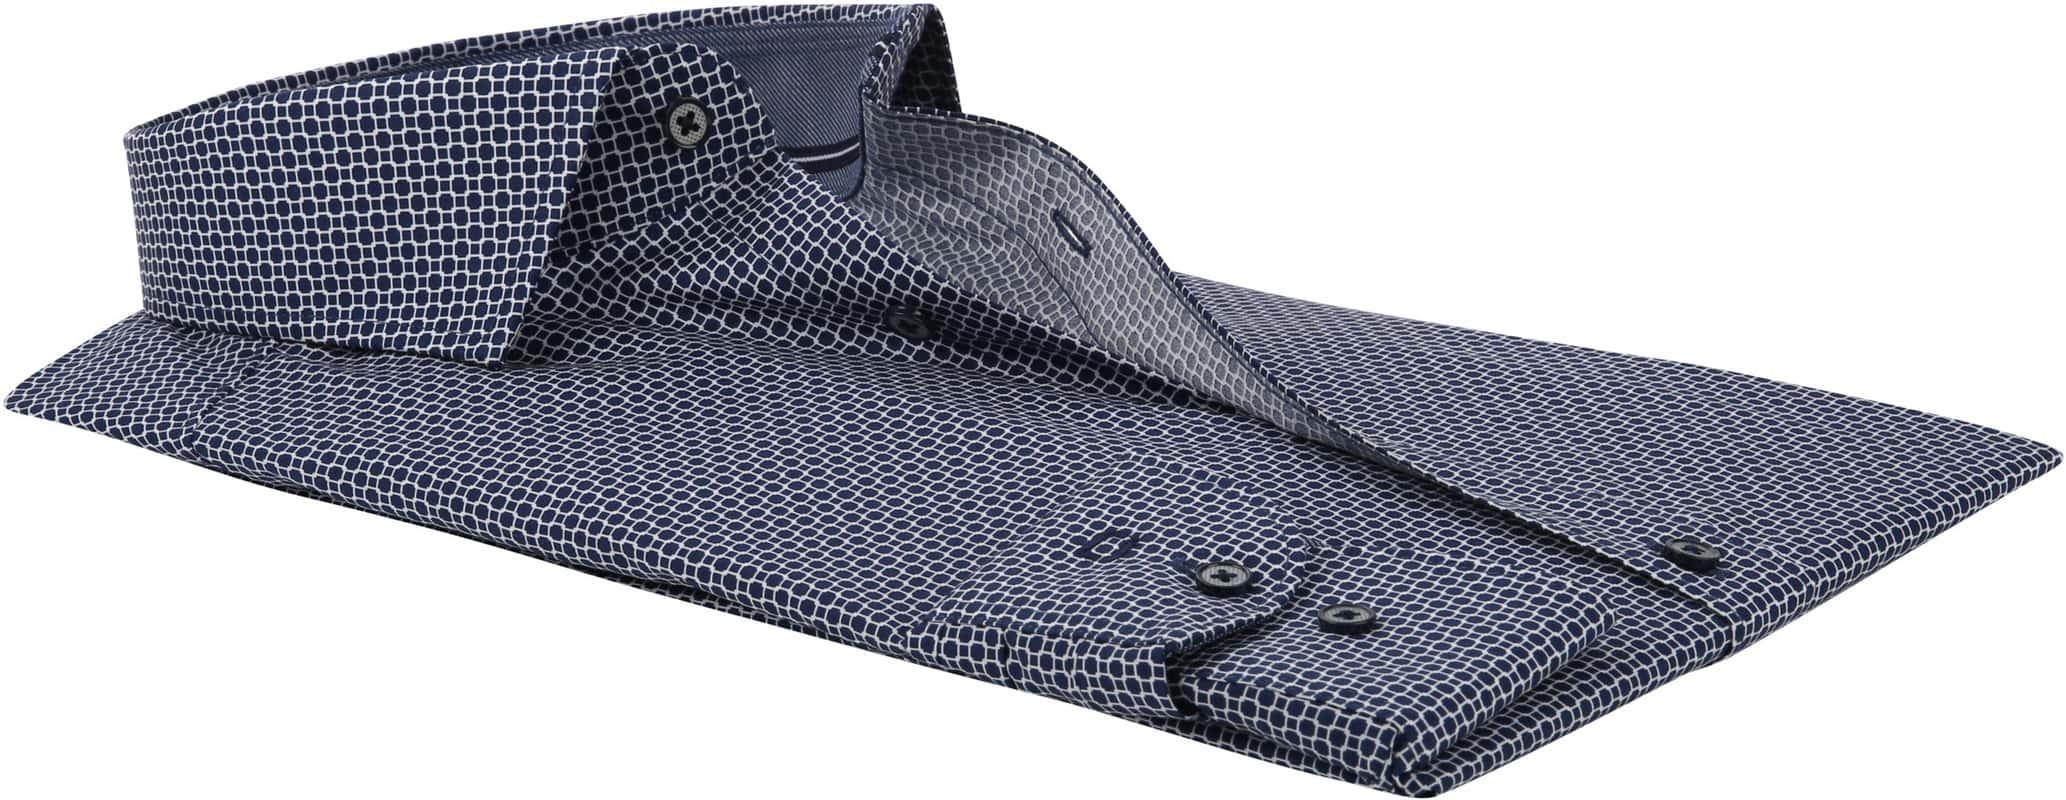 OLYMP Overhemd Level 5 Blauw Dessin WS foto 3